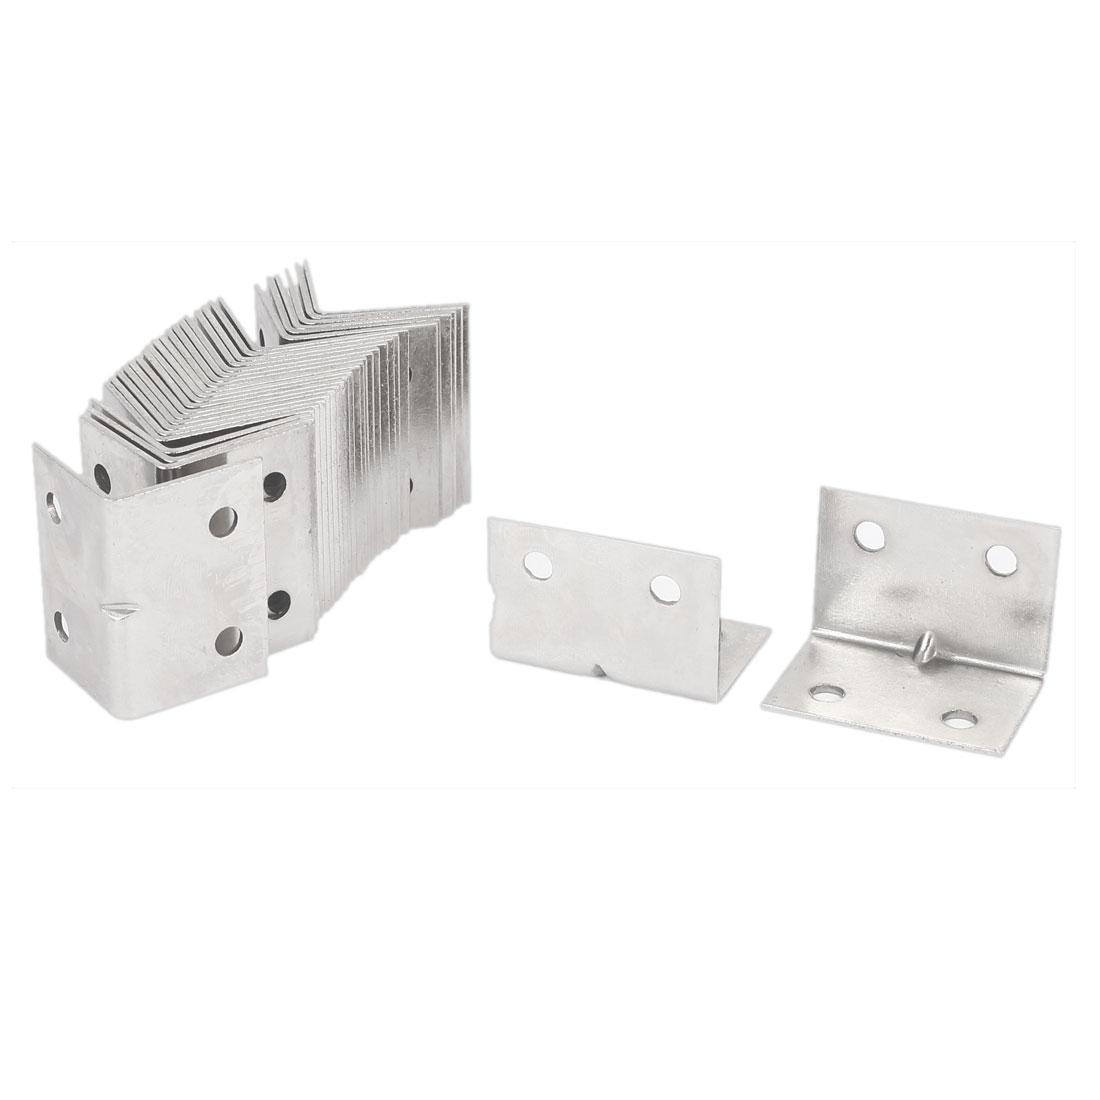 L Shaped 4 Holes Metal Corner Brace Angle Bracket 37mmx26mmx26mm 30pcs